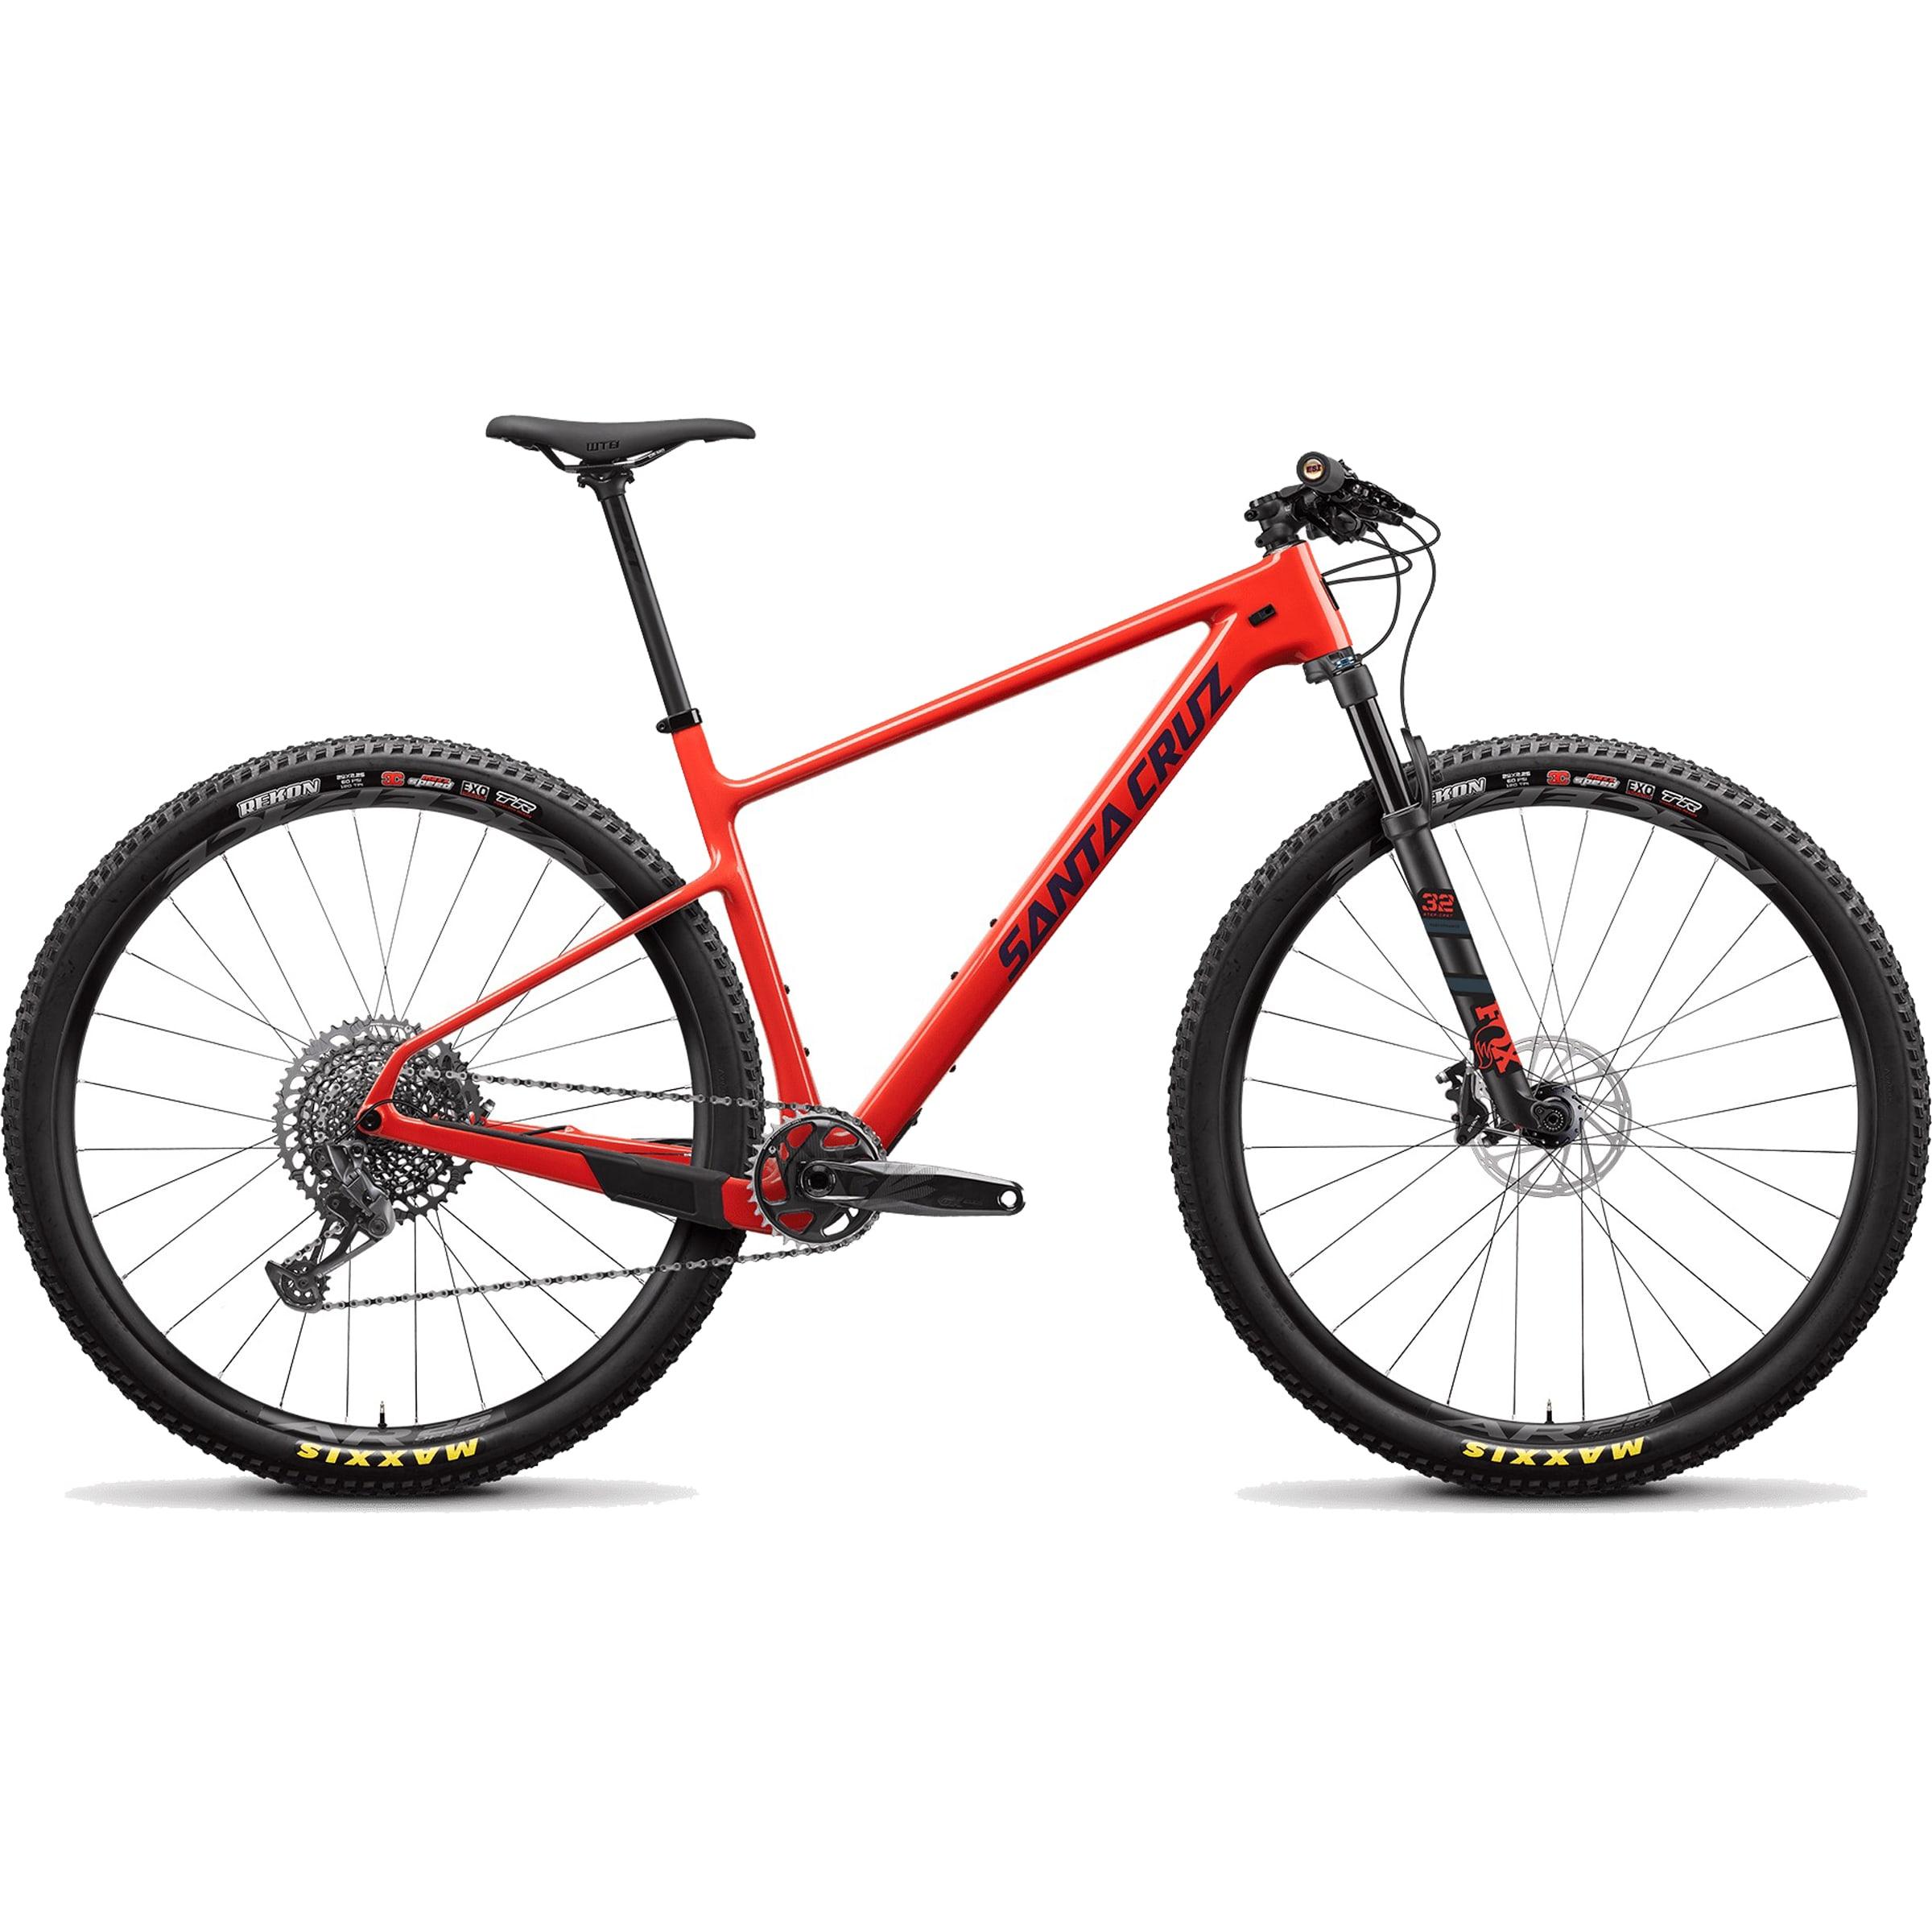 Image of Santa Cruz Highball C S 29er Mountain Bike 2021 Ember